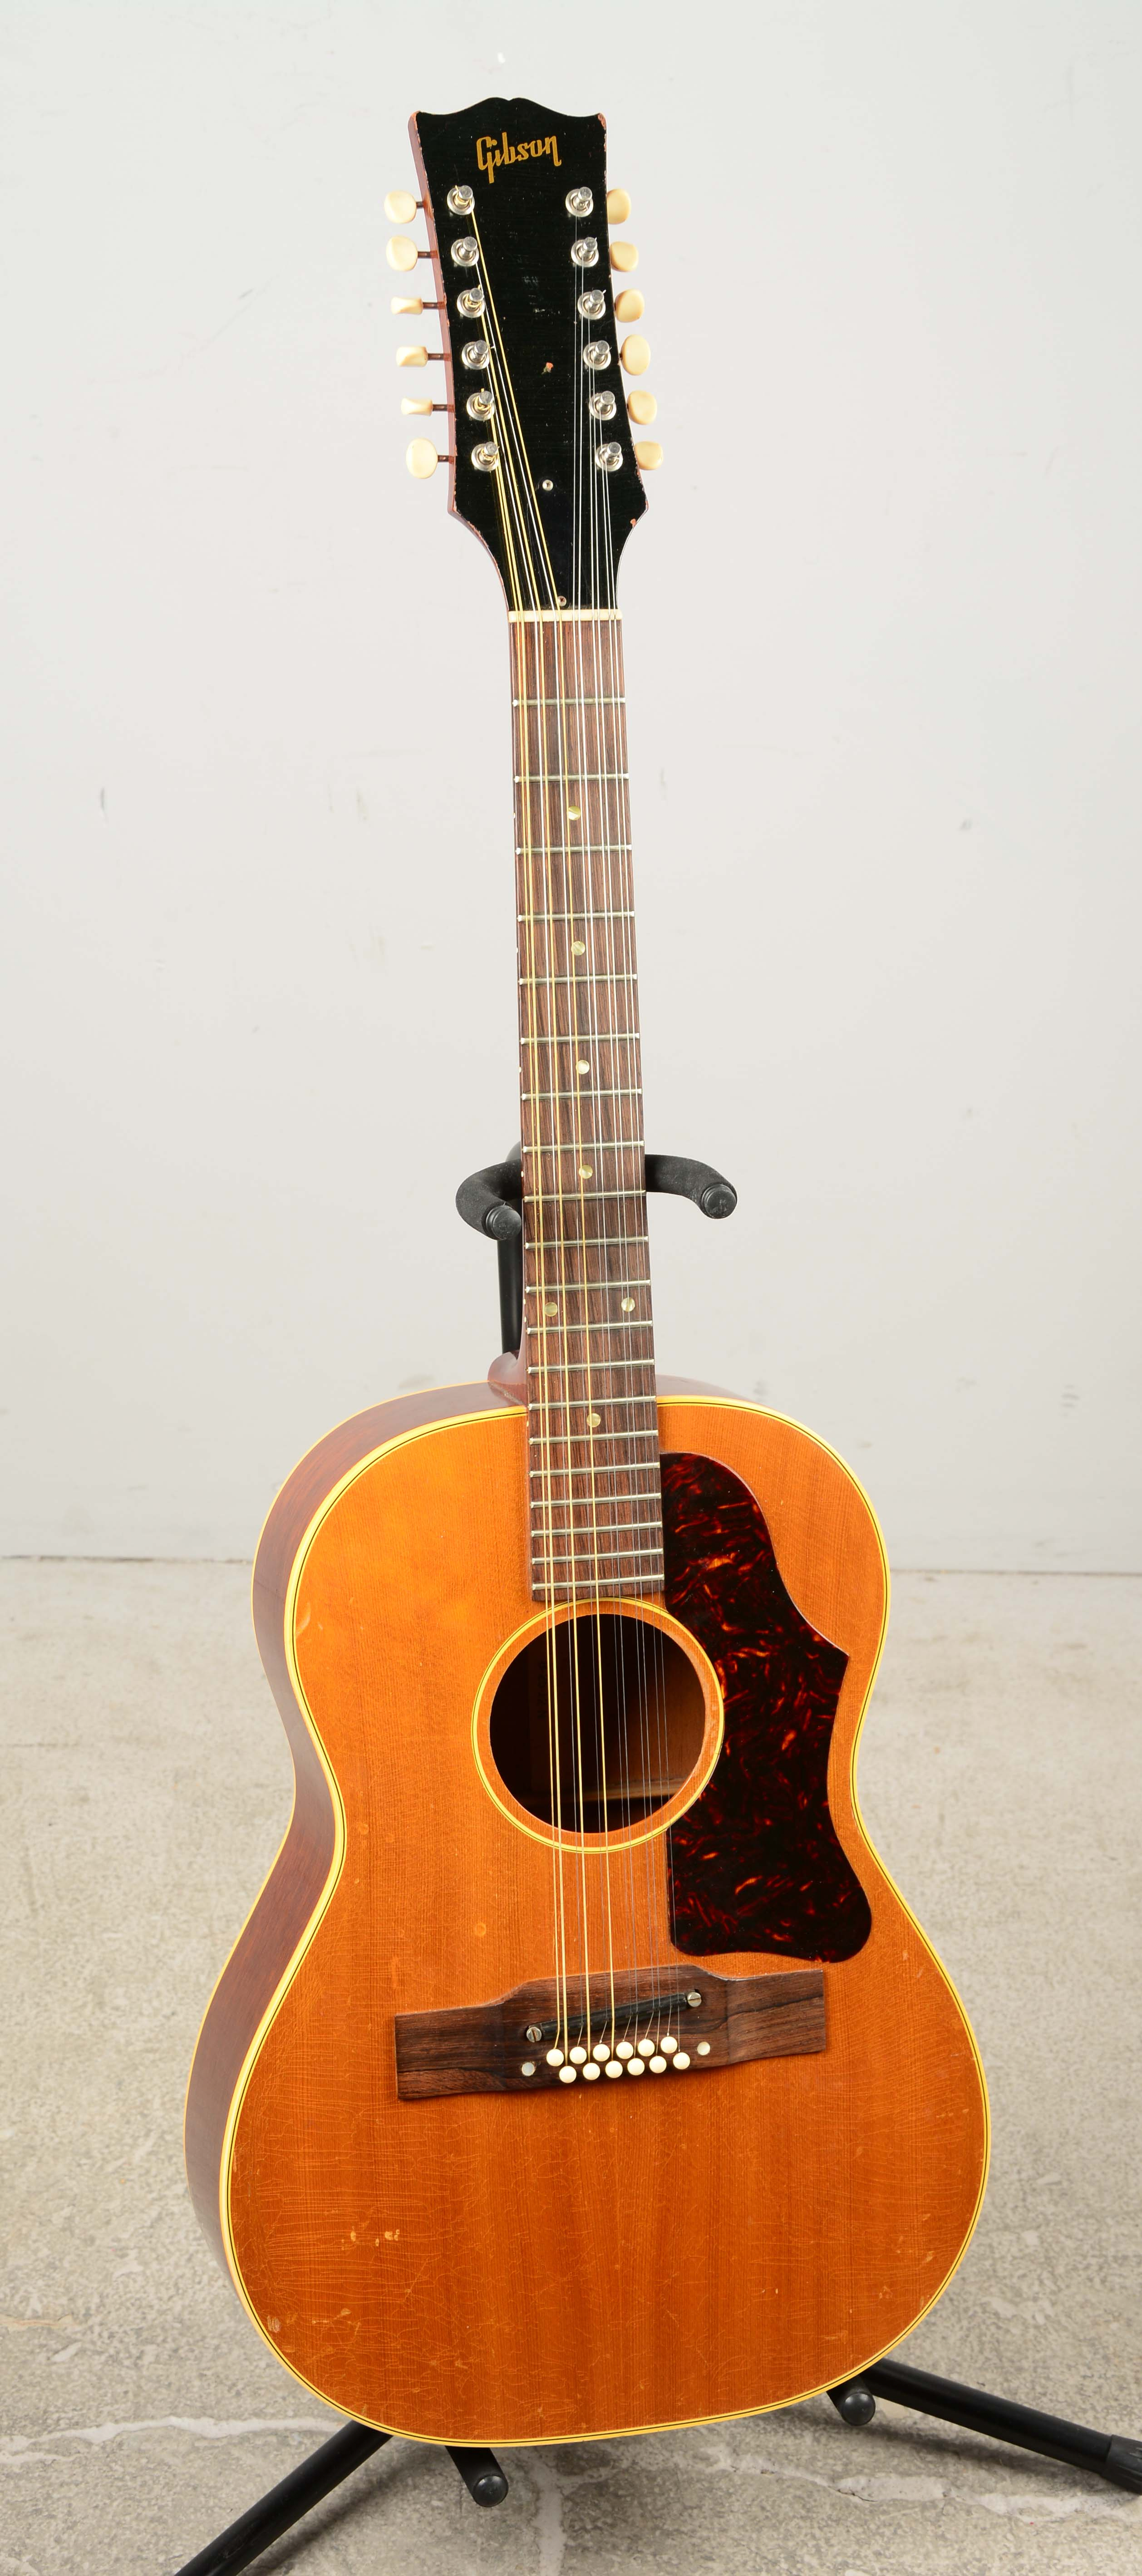 lot detail gibson b25 12n 12 string acoustic guitar. Black Bedroom Furniture Sets. Home Design Ideas